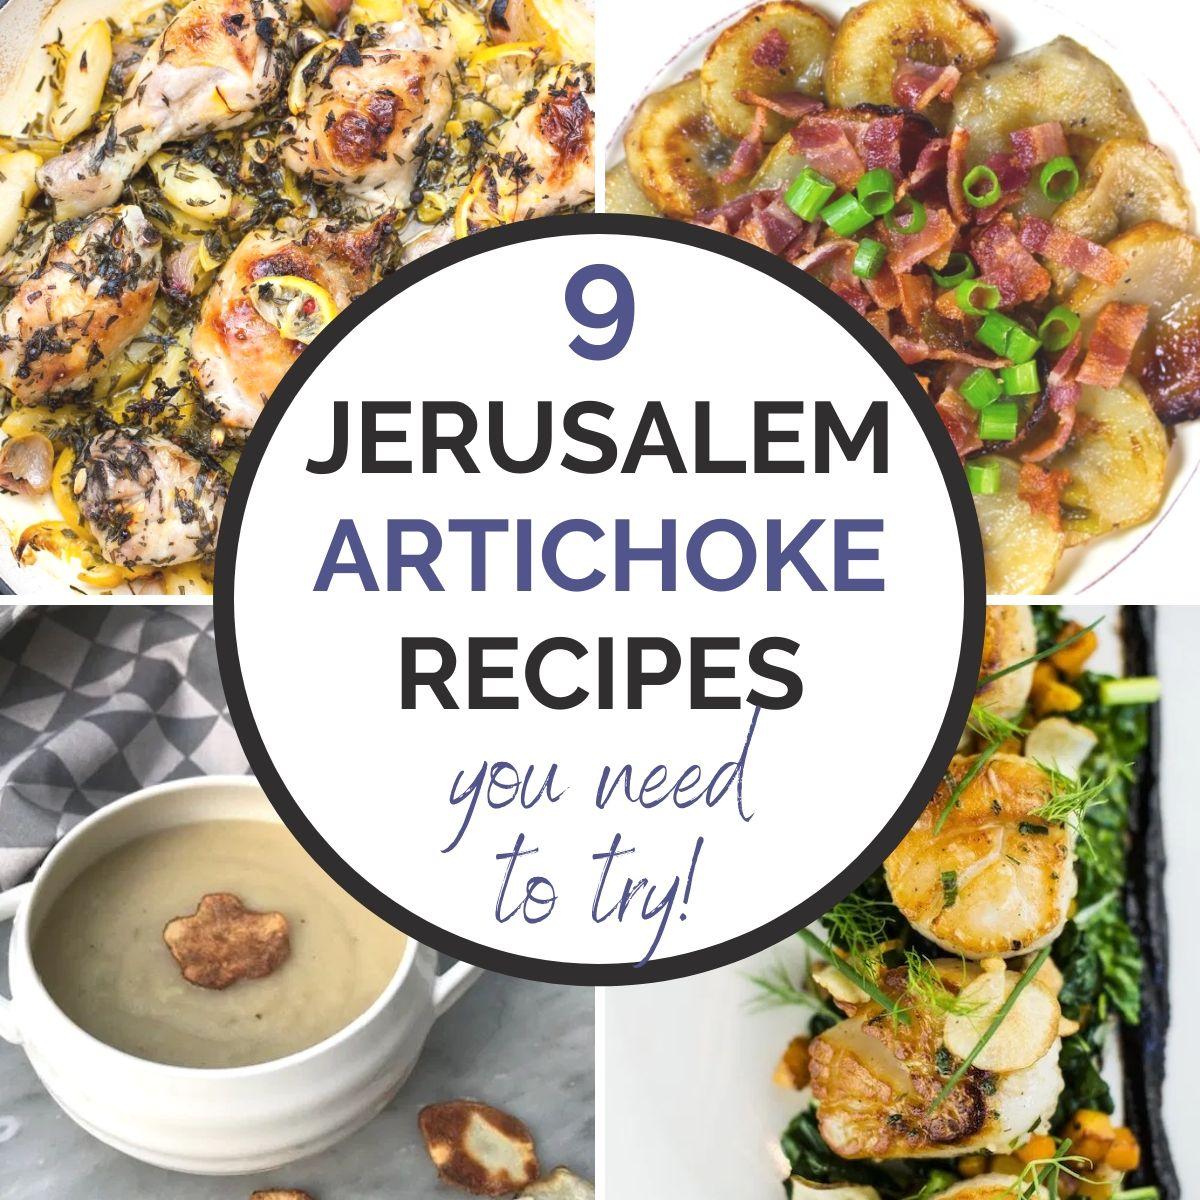 jerusalem artichoke recipes collage